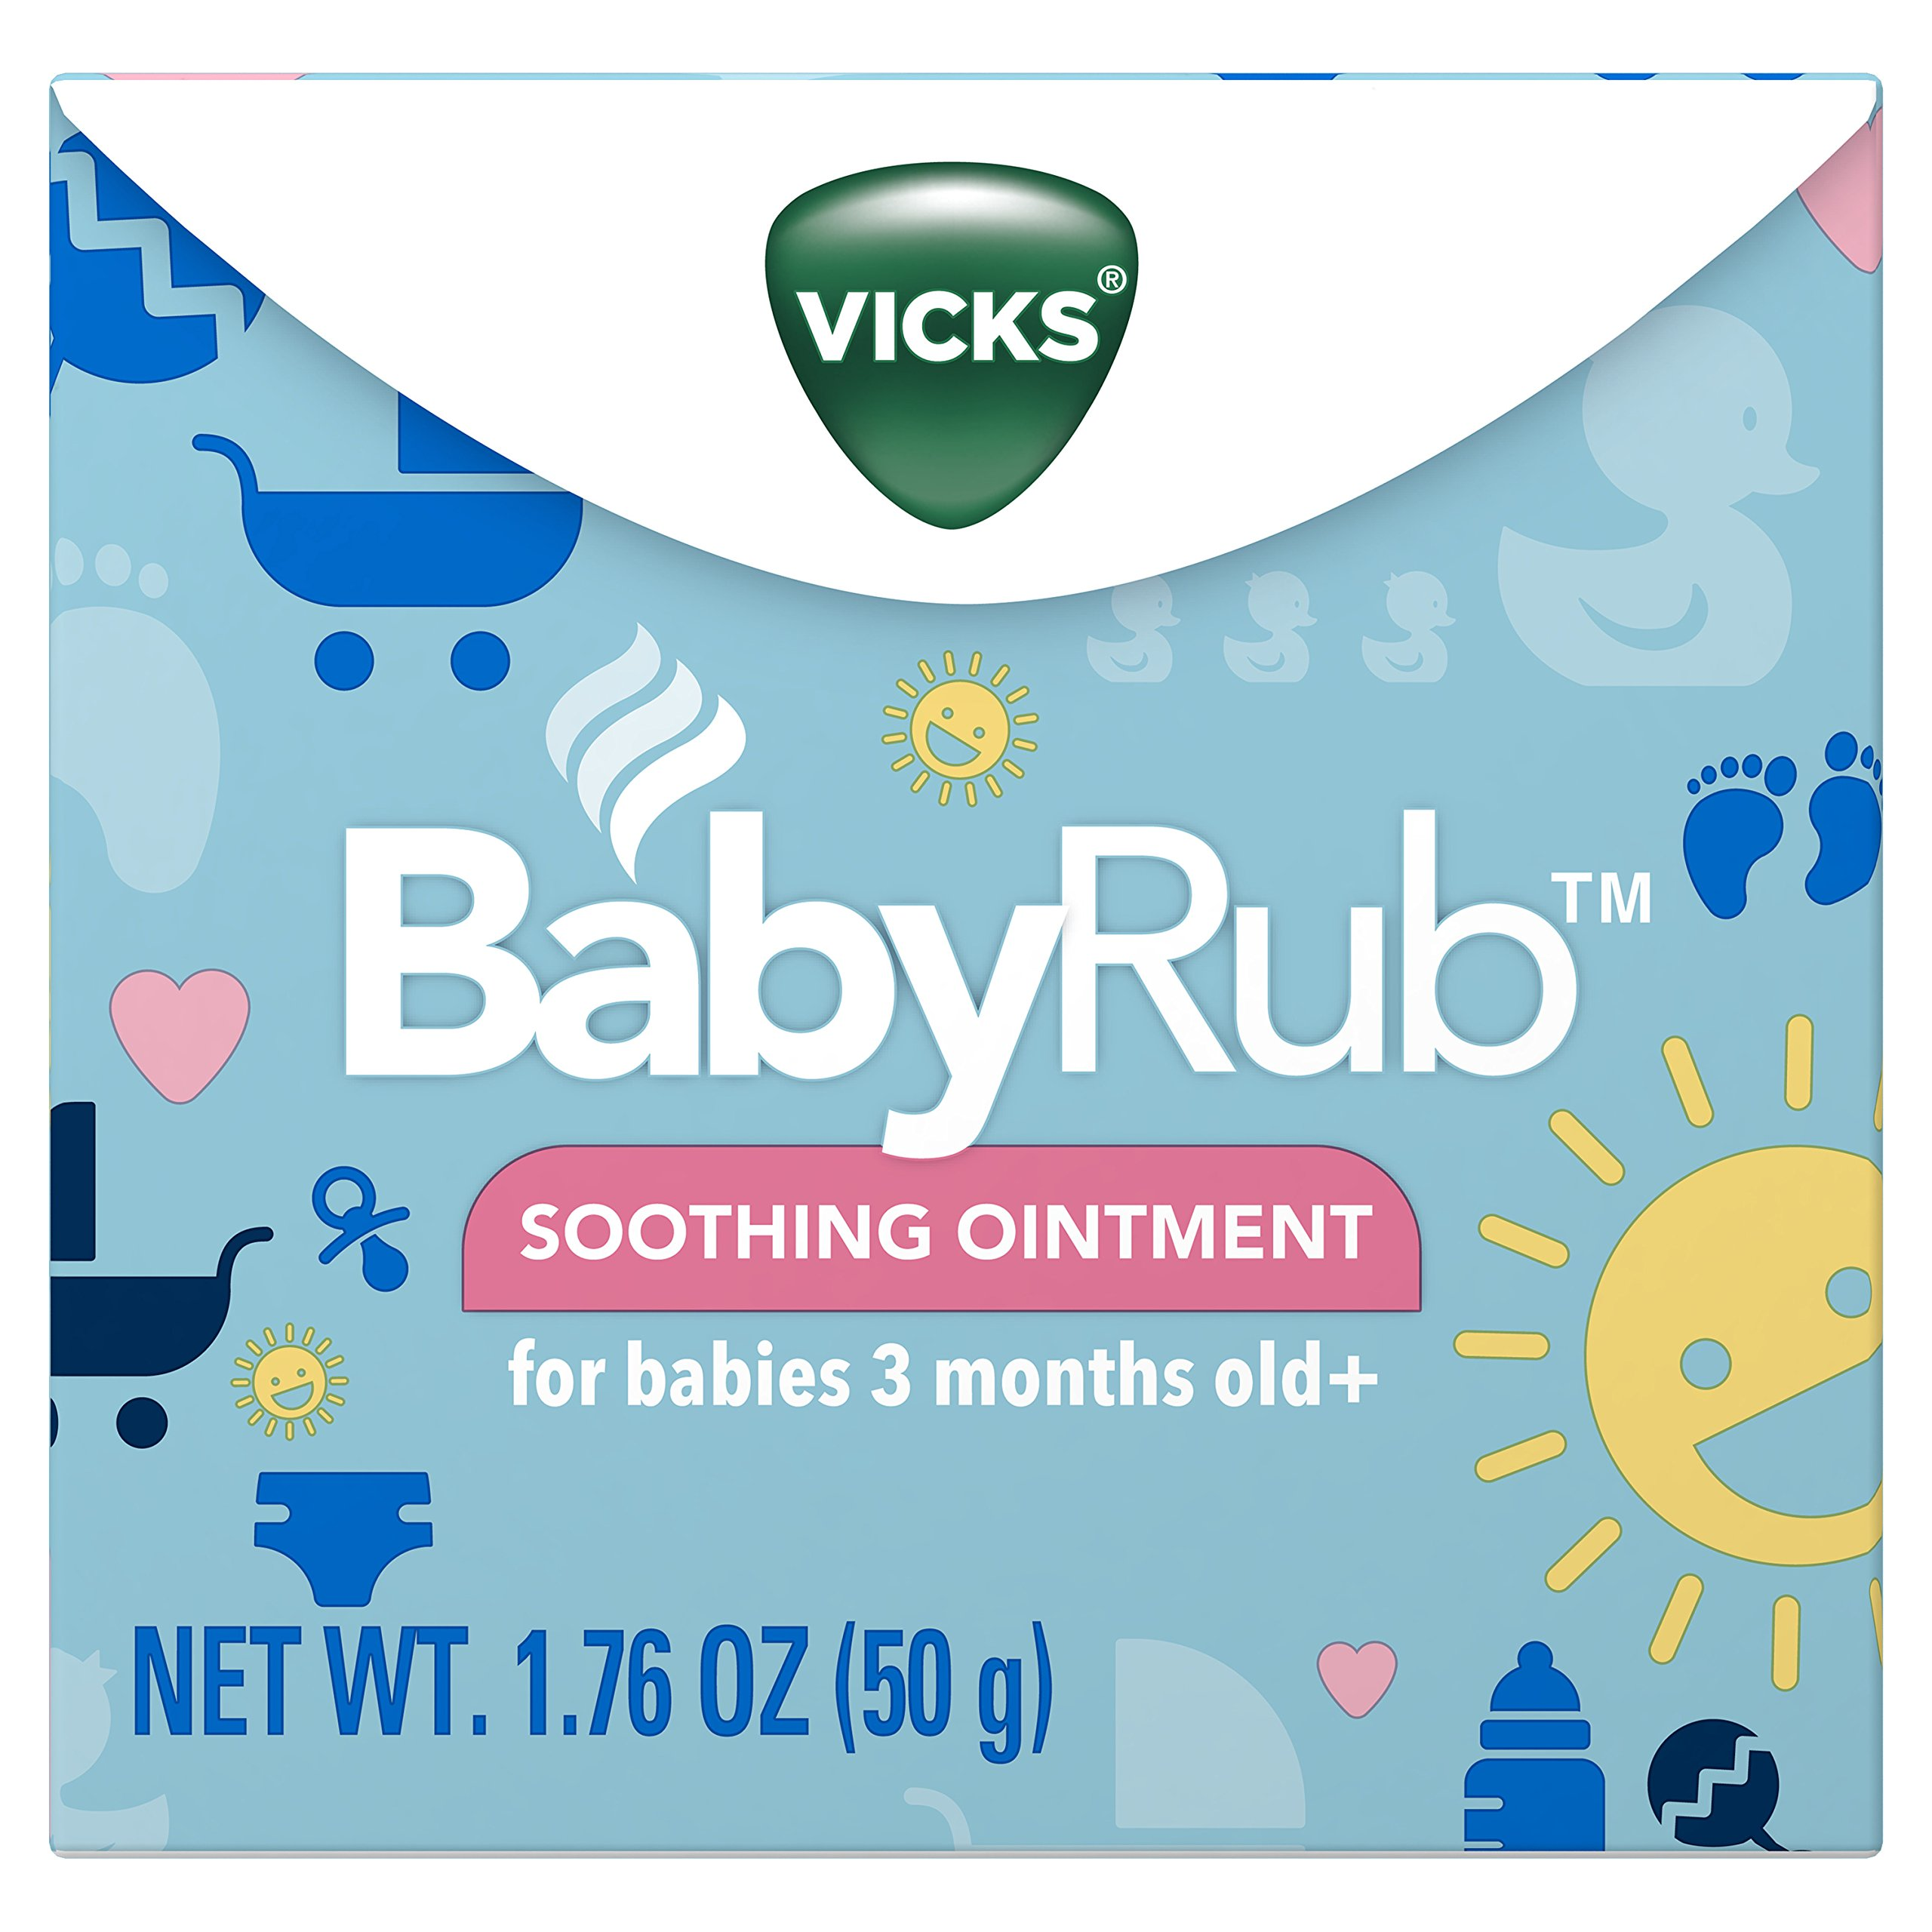 Vicks Babyrub Soothing Ointment, 1.76 Ounce